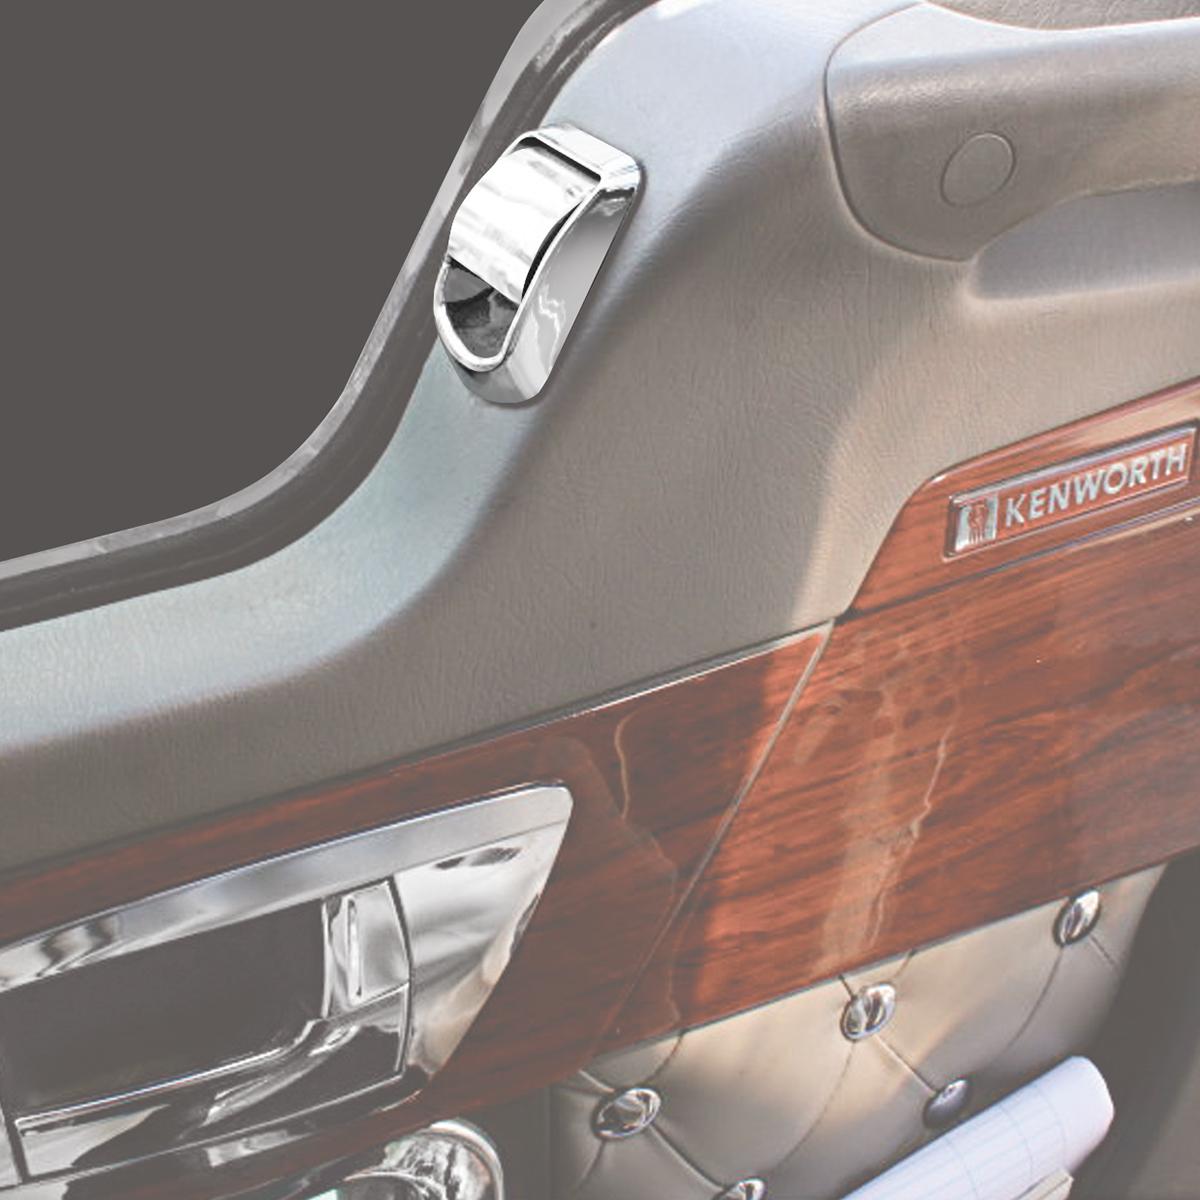 67848 Doow Window Single Switch Cover for Kenworth W&T